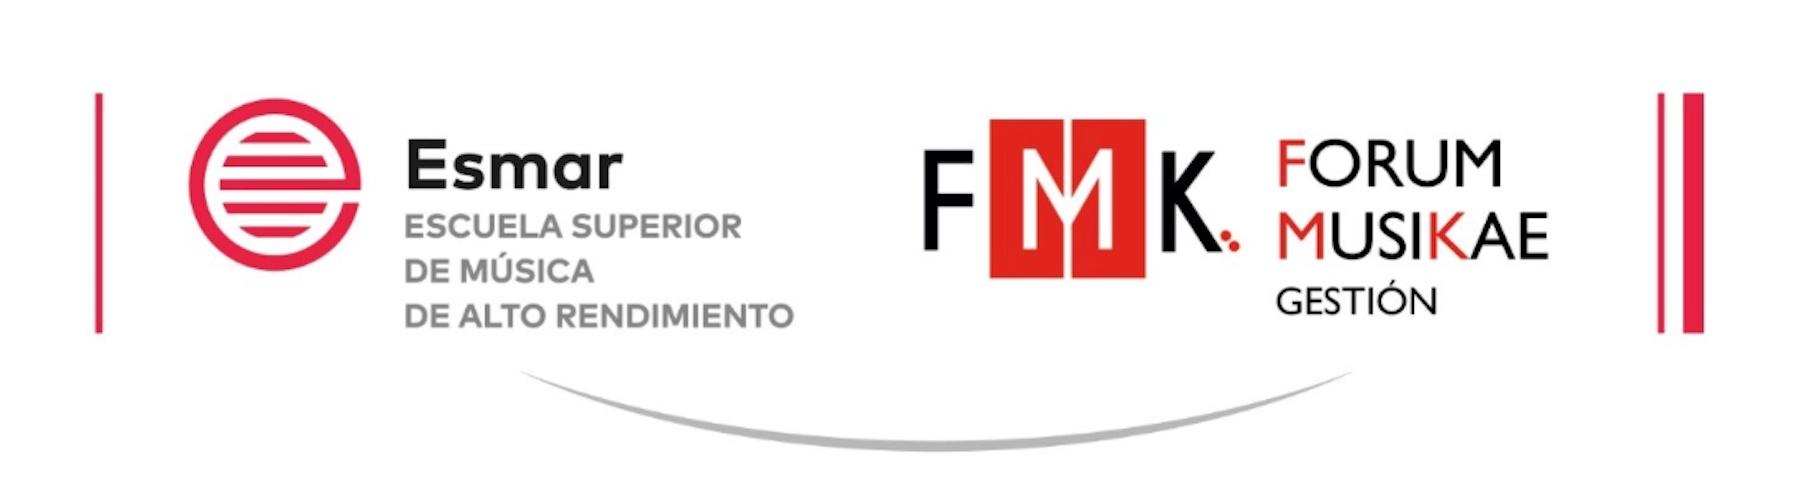 Forum Musikae – ESMAR